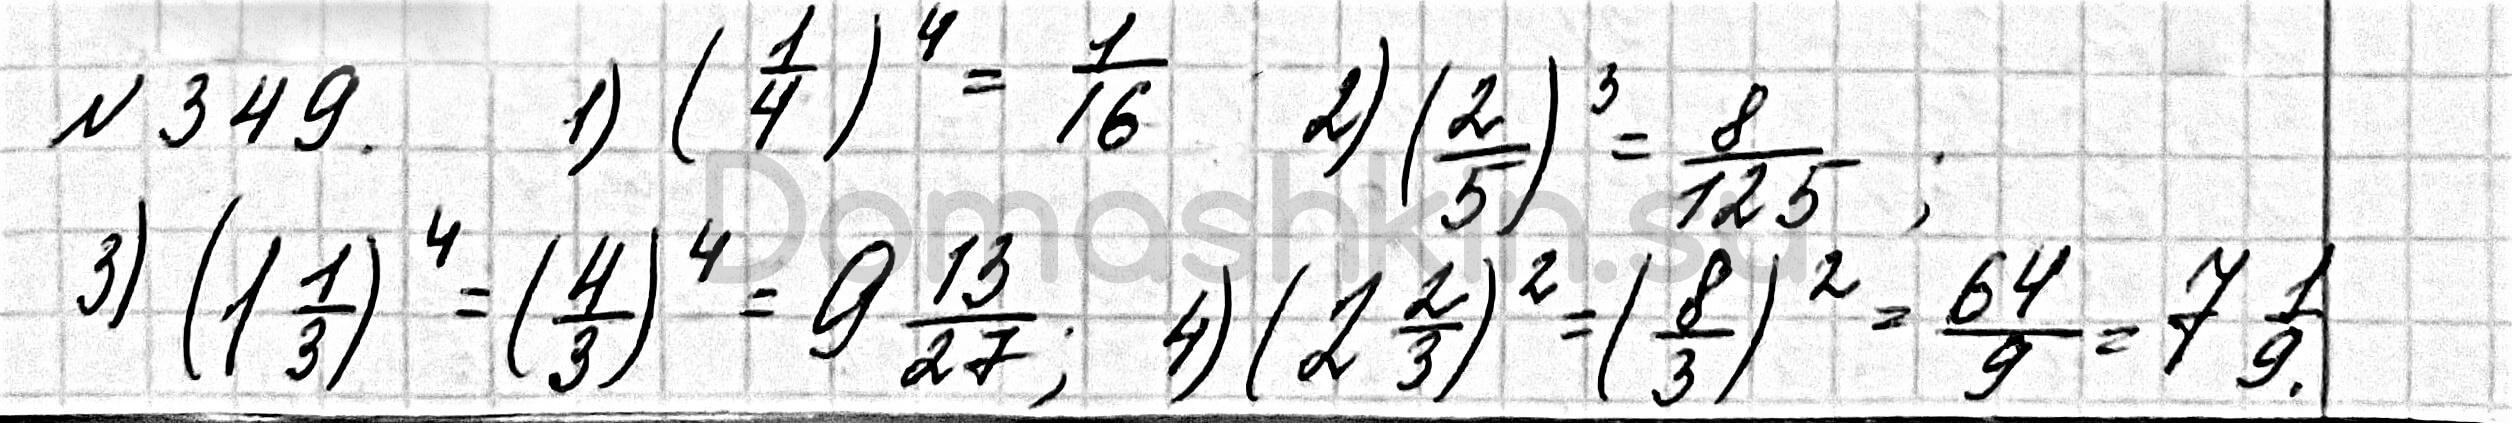 Математика 6 класс учебник Мерзляк номер 349 решение